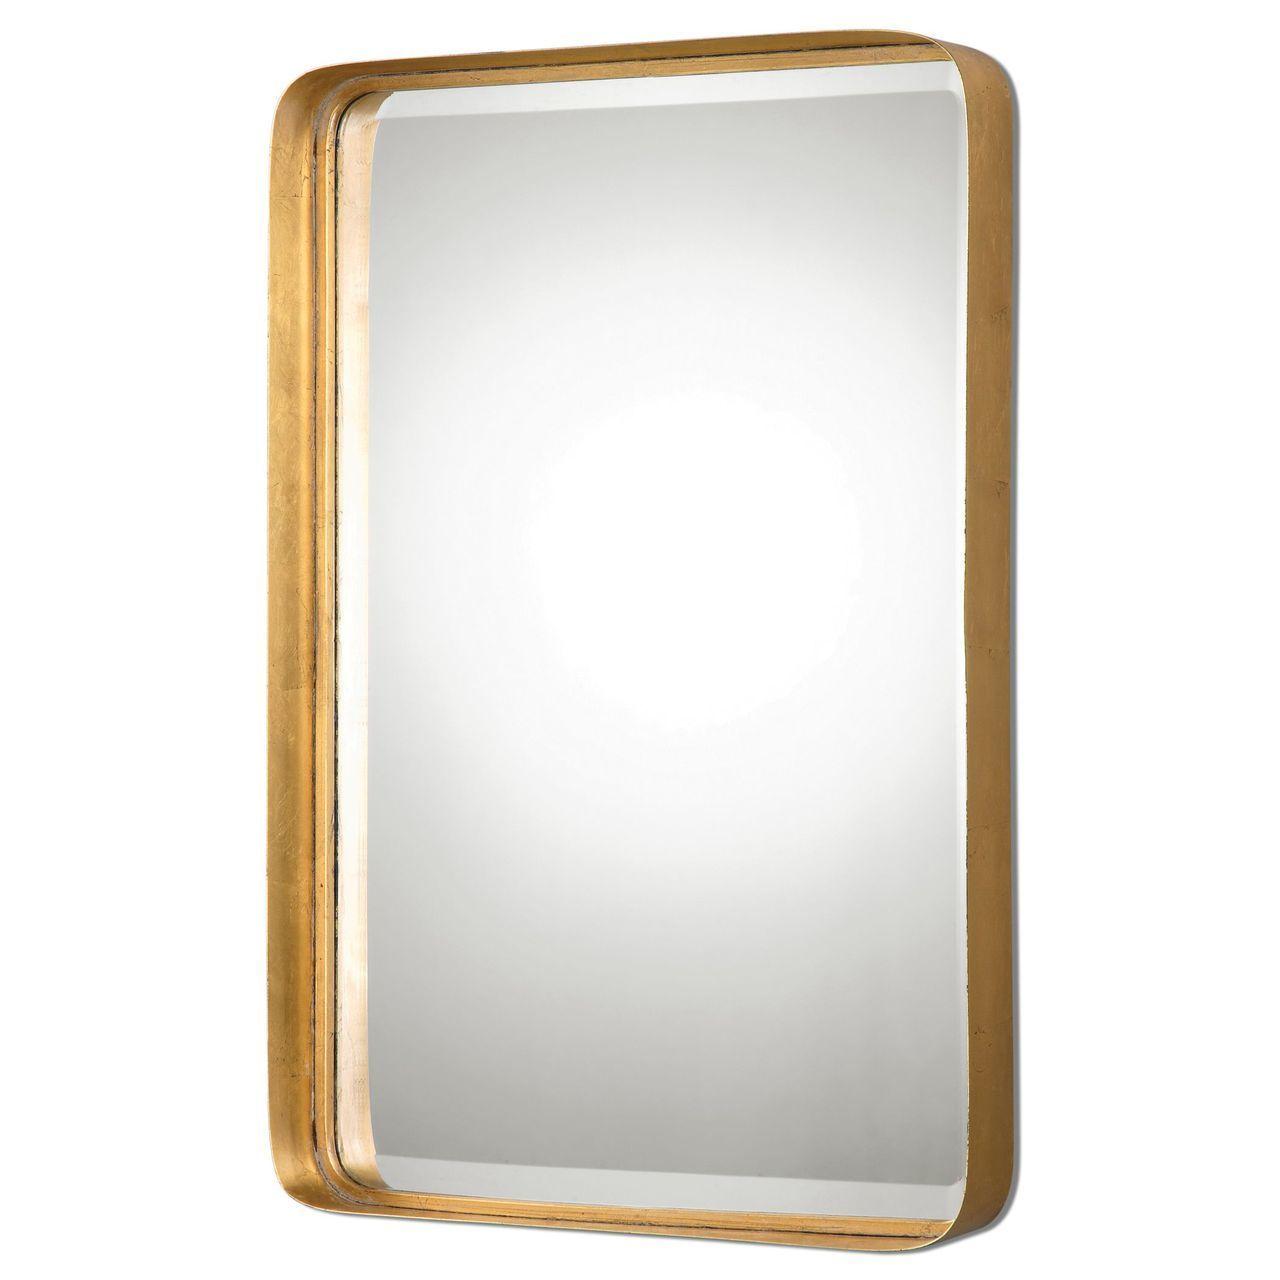 Crofton Antique Gold Mirror Bathroom In 2019 Antique